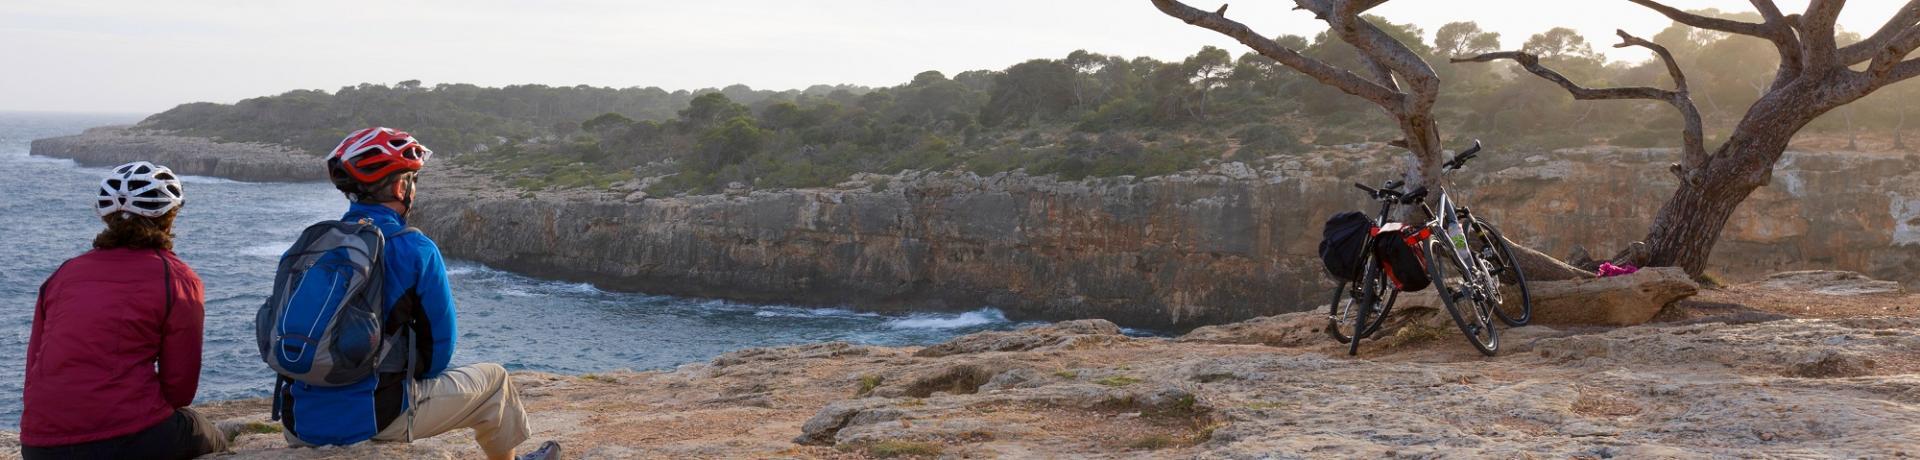 Mallorca-Radfahren-Emotion_GI-149690221.jpg